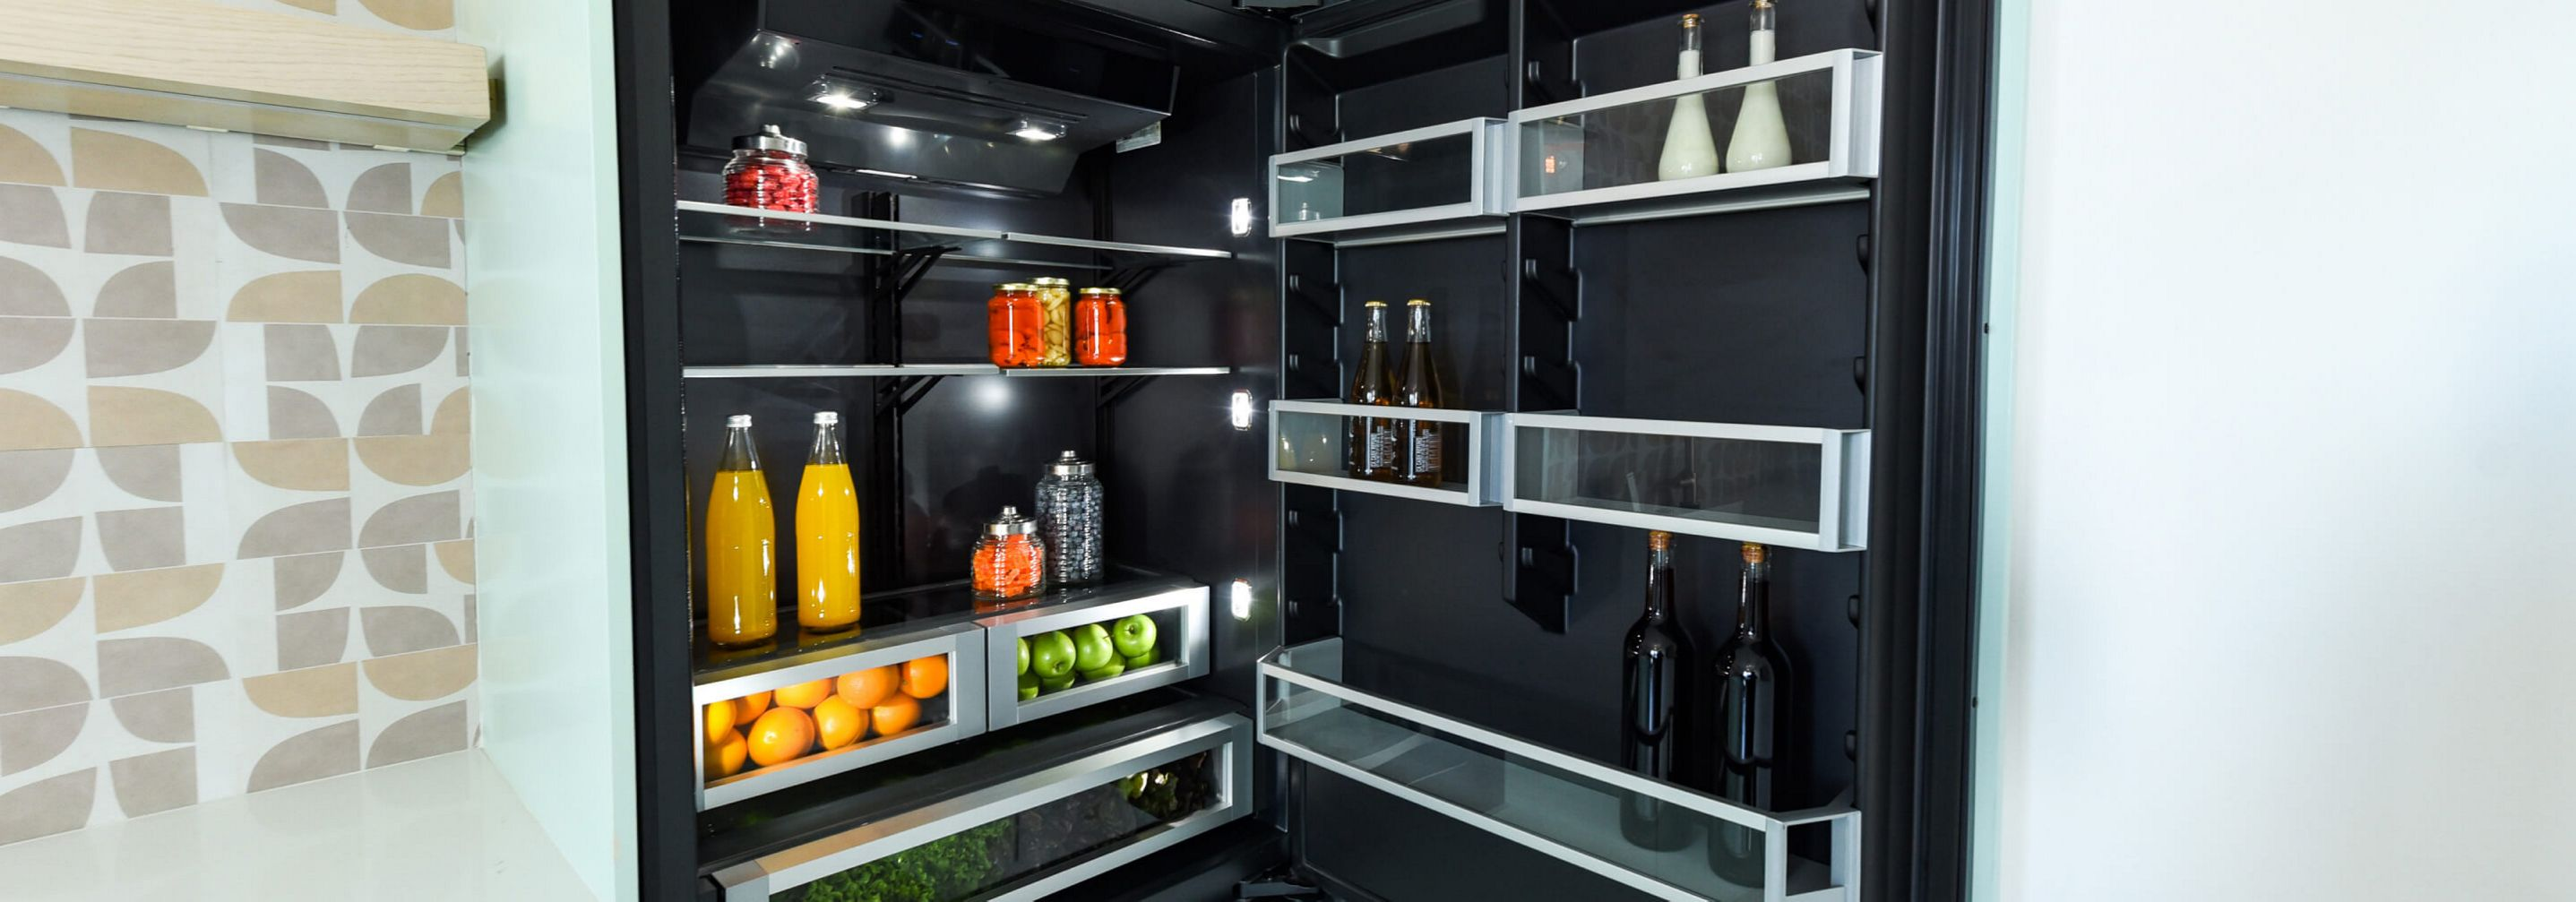 A JennAir® Built-In Bottom Freezer Refrigerator.